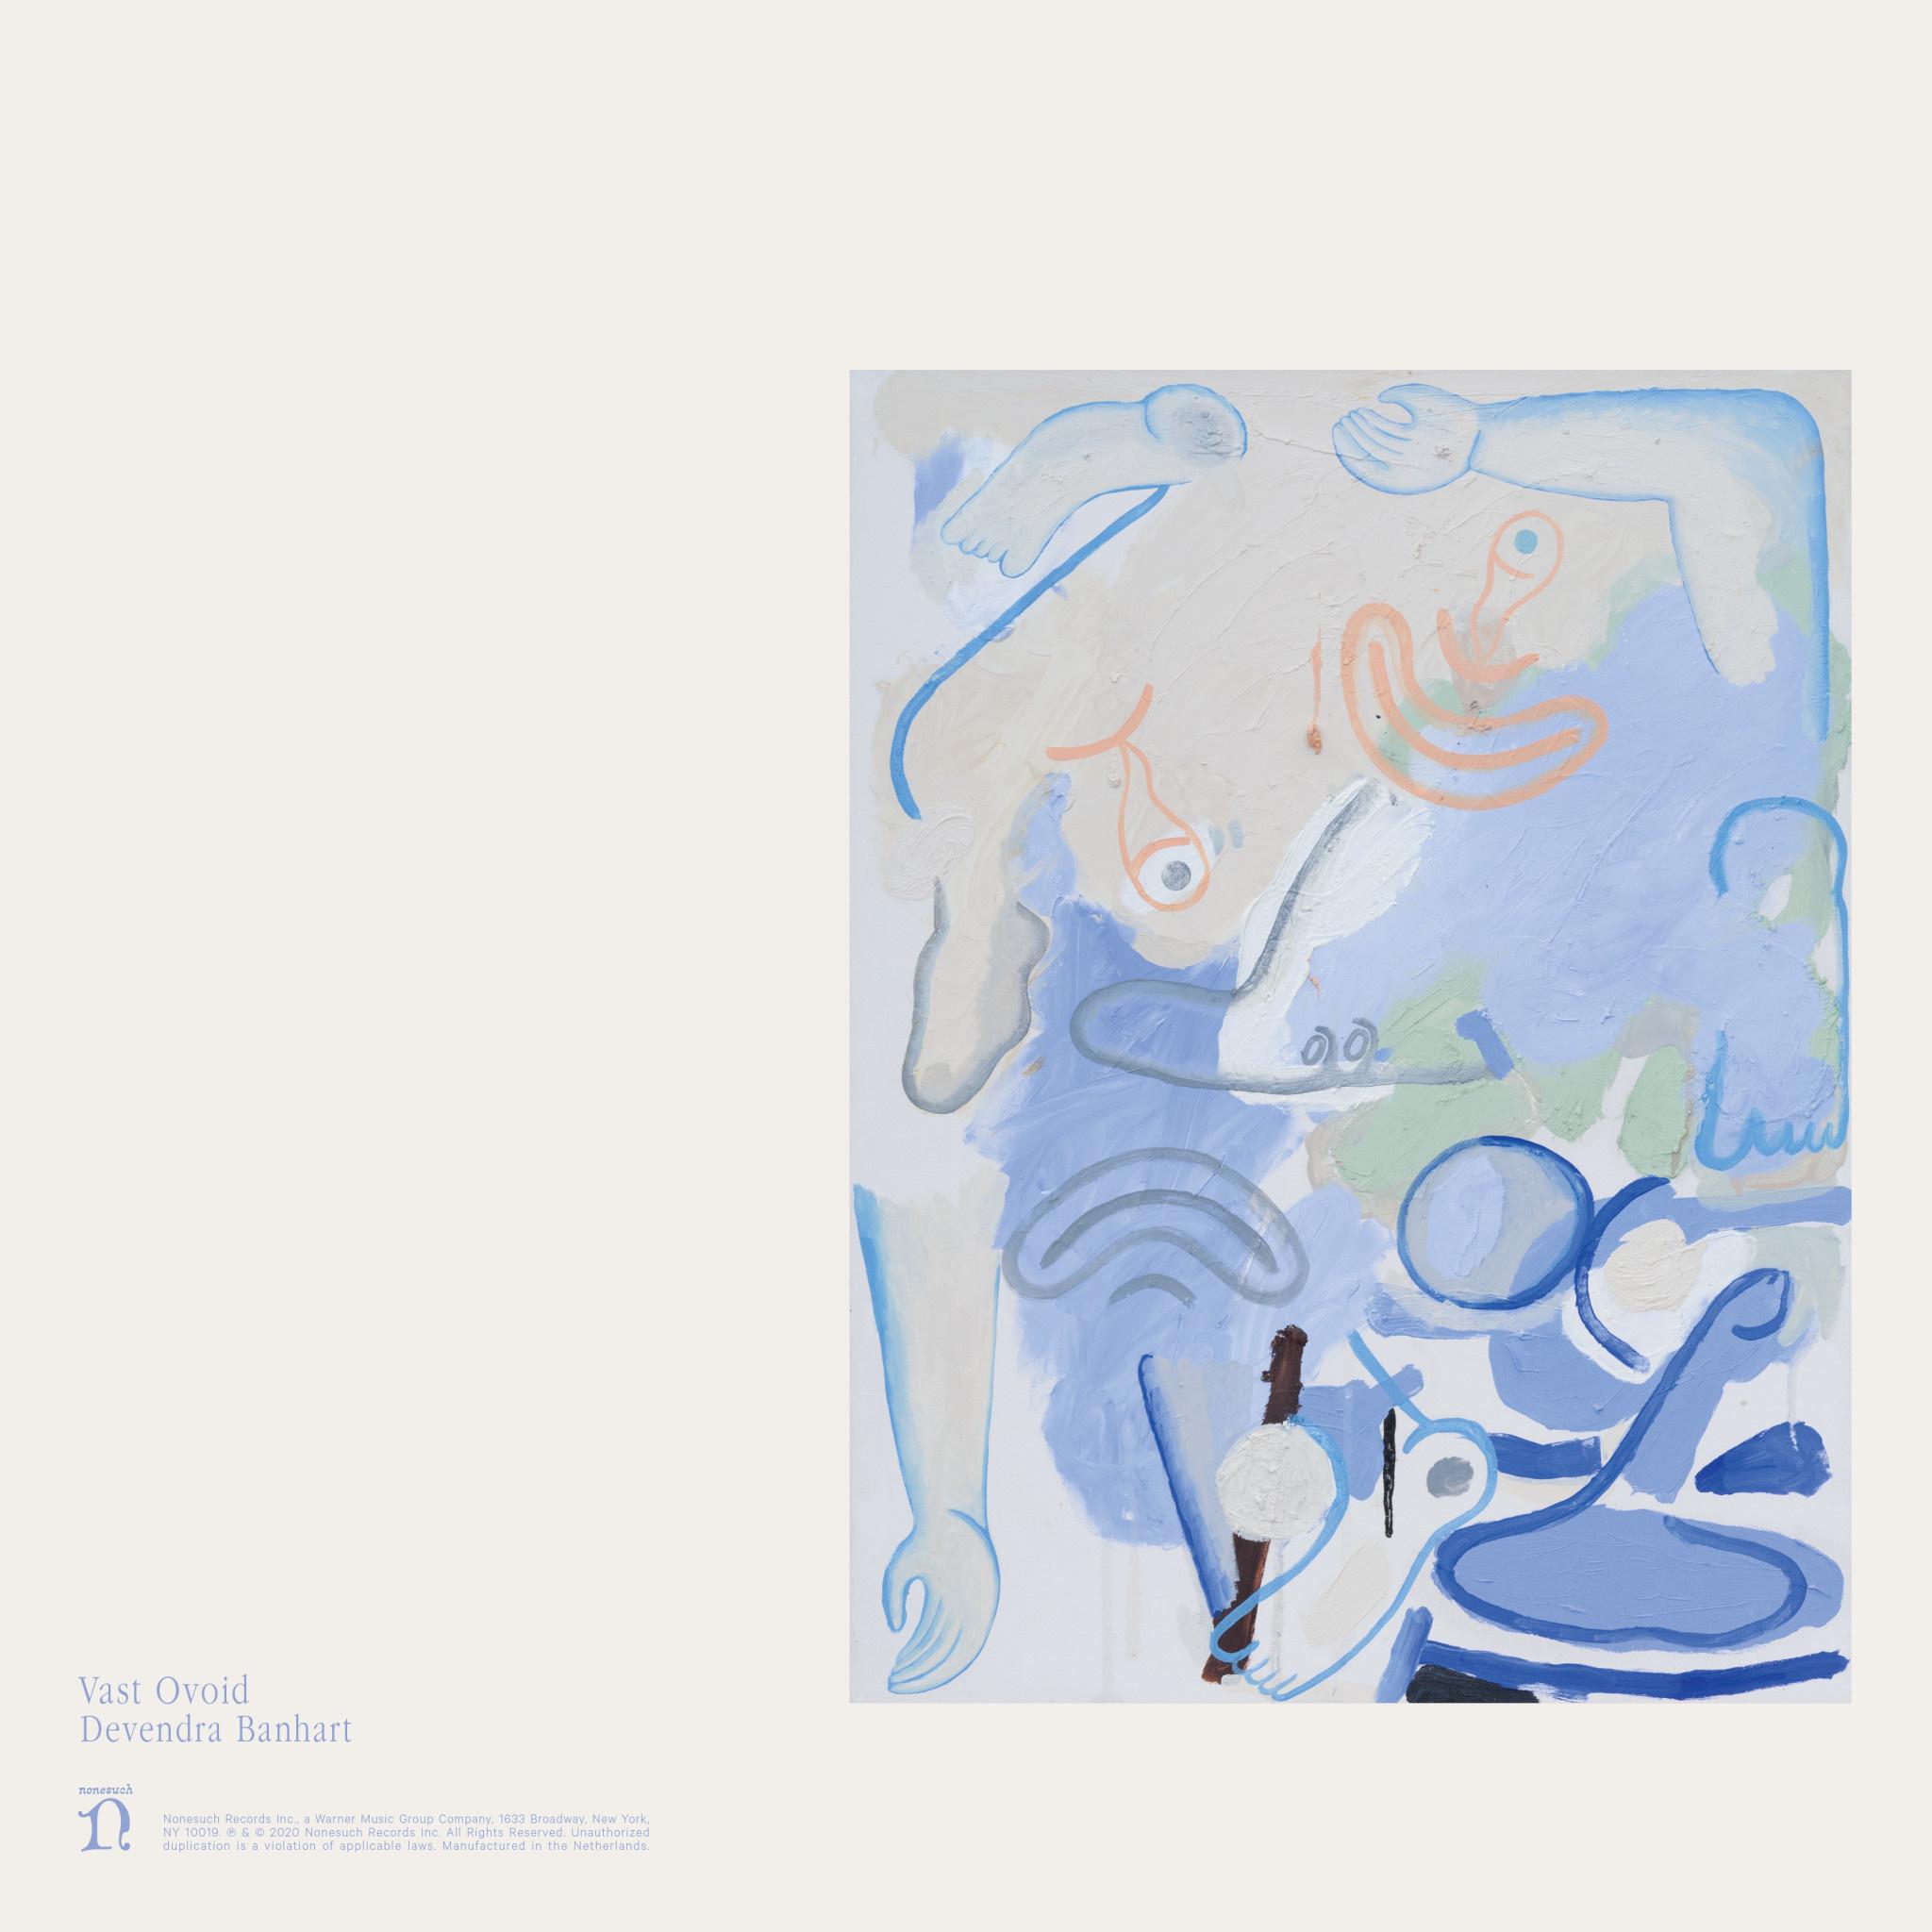 Nonesuch Devendra Banhart - Vast Ovoid (Coloured Vinyl)